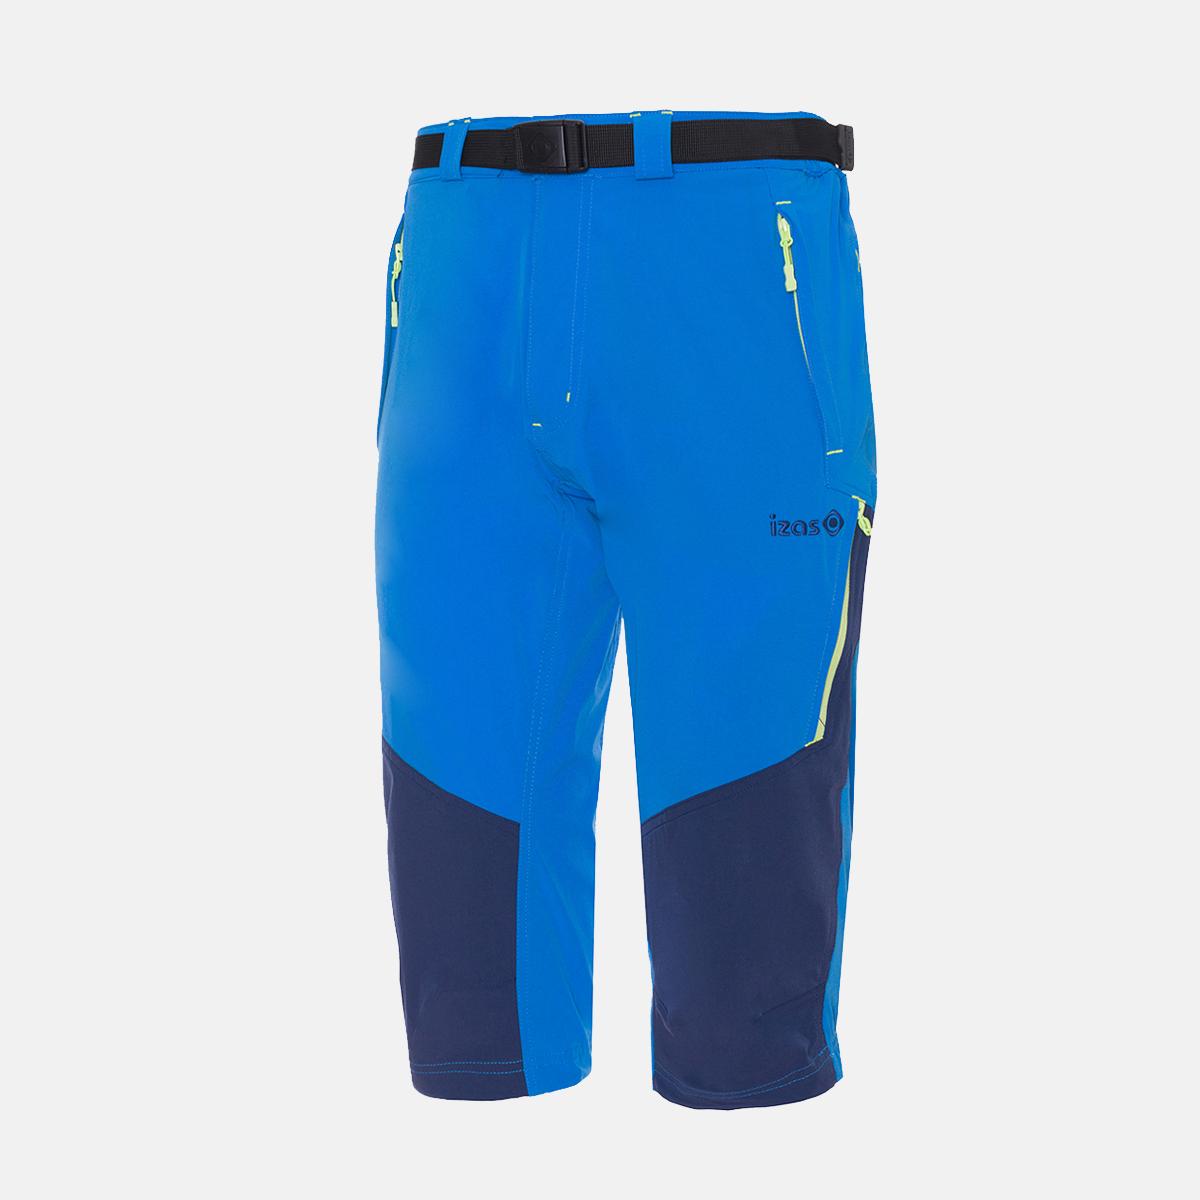 MAN'S OSPIKA 3/4 STRETCH PANT BLUE